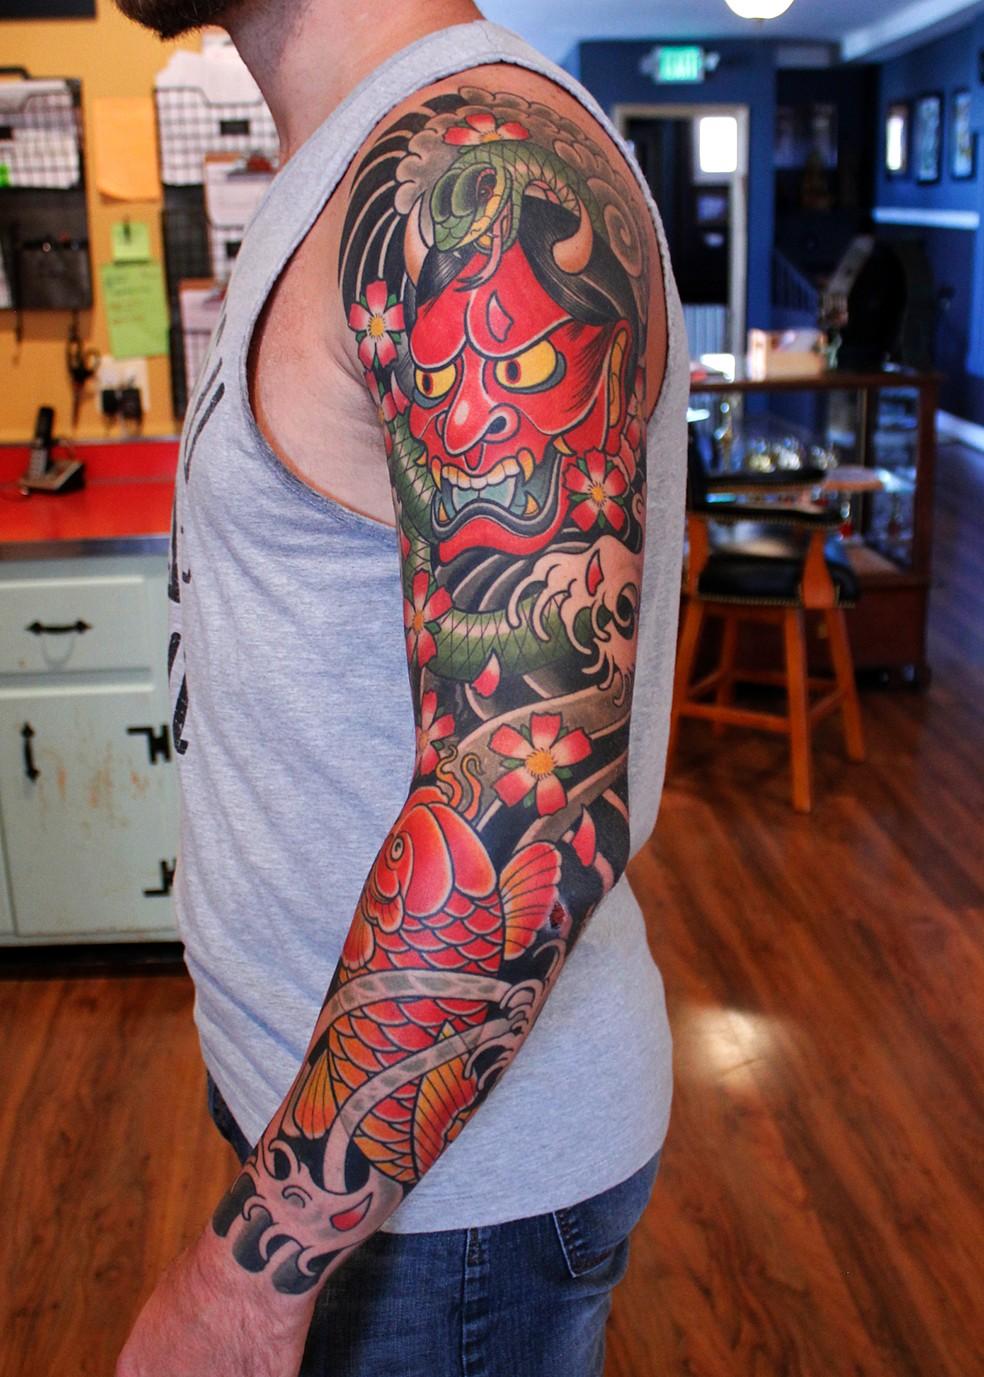 Dave wah tattoo artist baltimore maryland for Best tattoo artist in tokyo